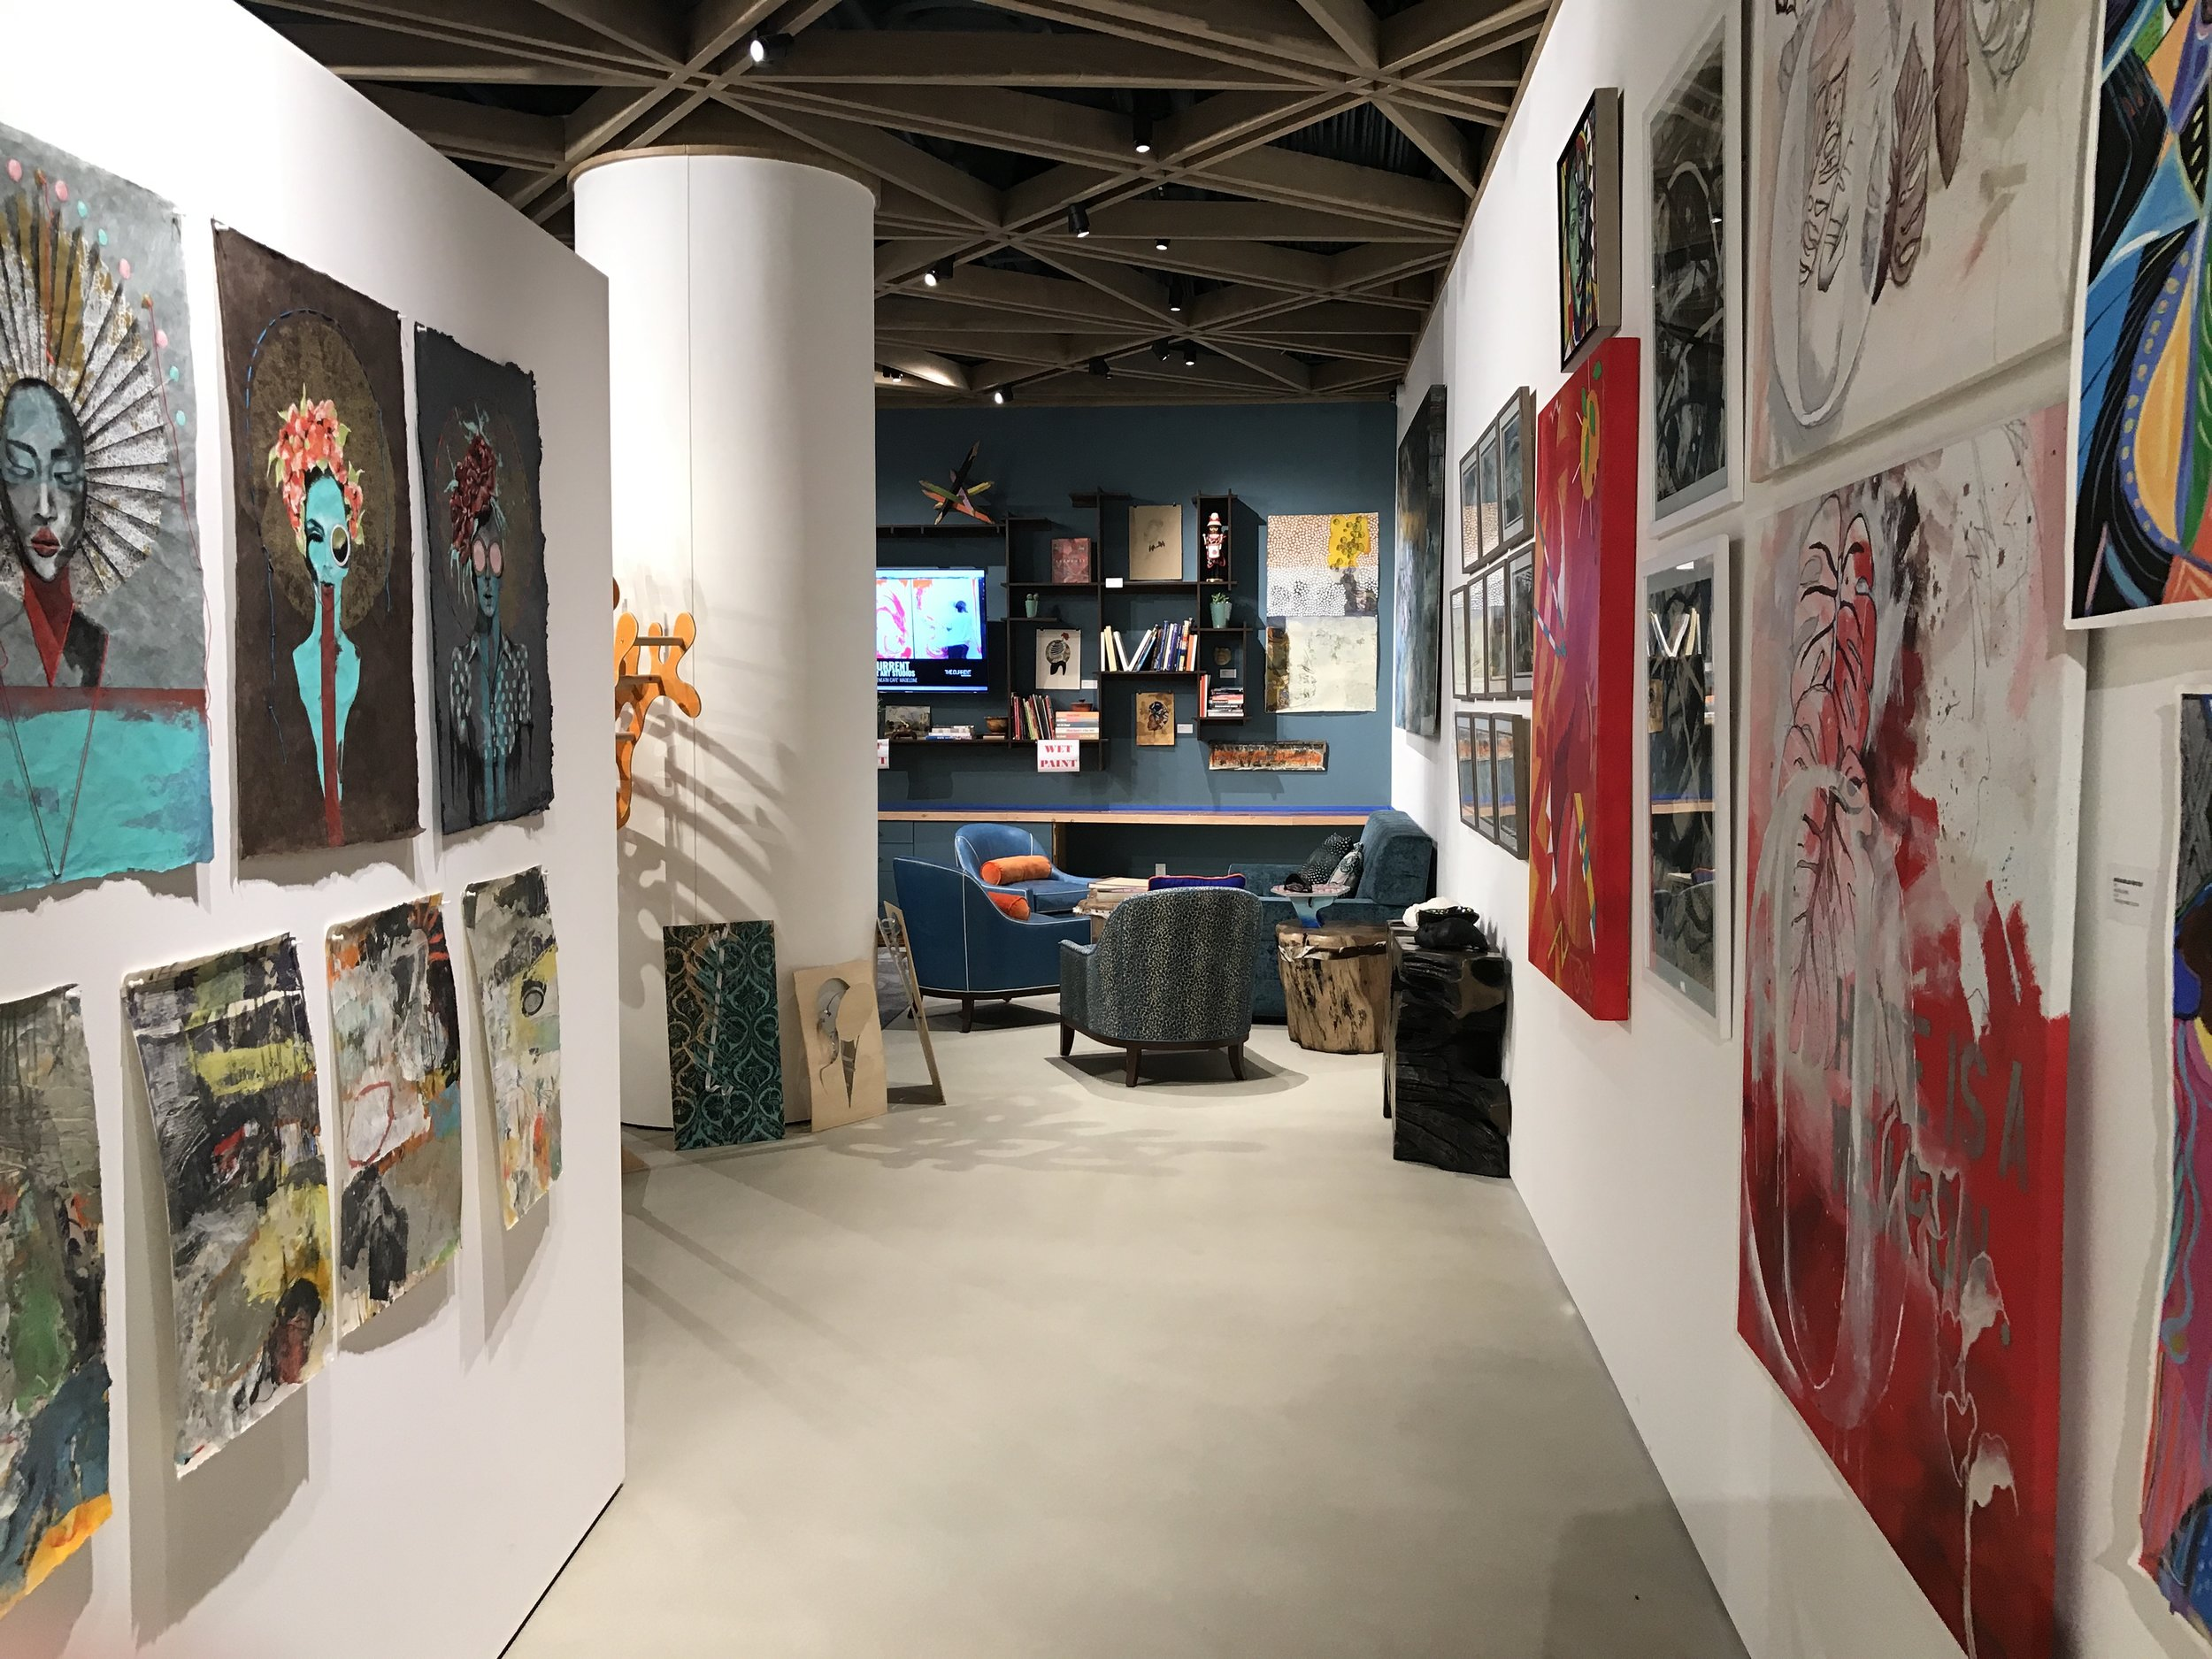 The Current Art Gallery - Nassau, Bahamas